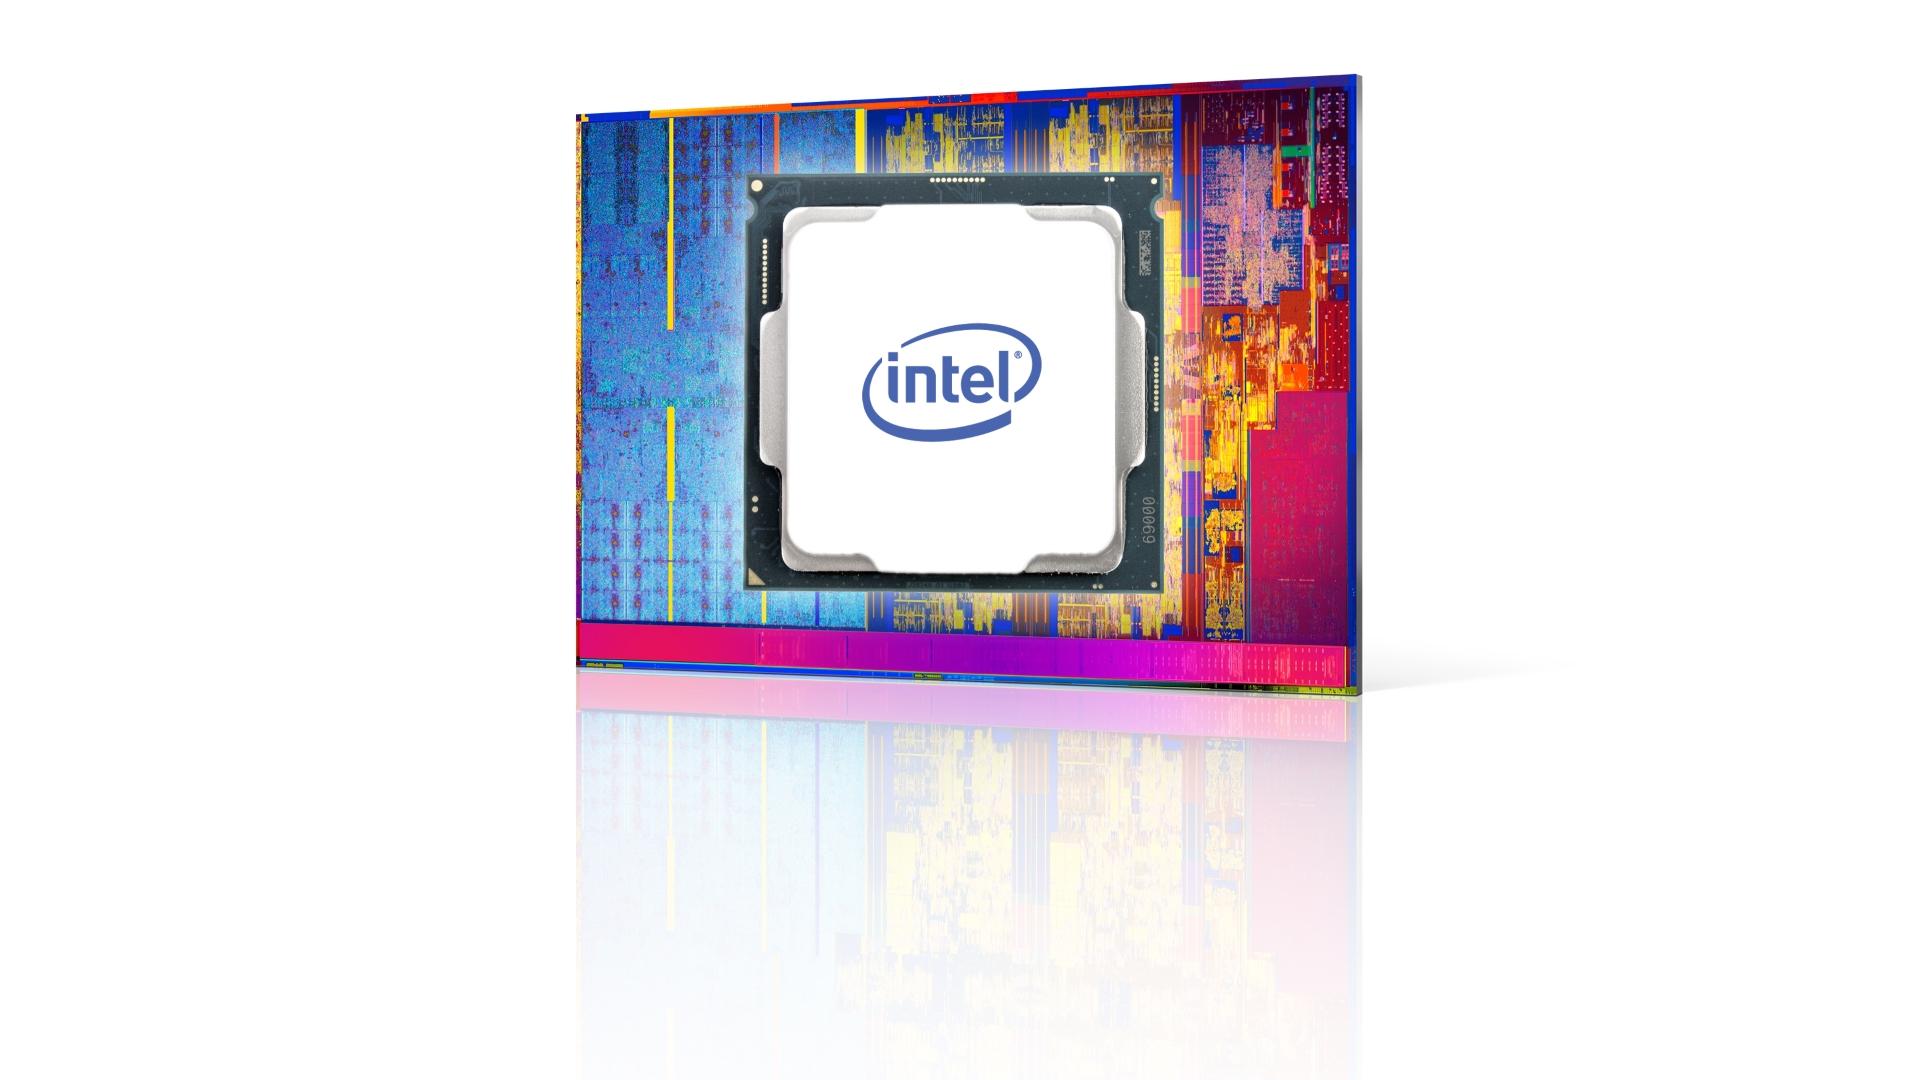 Intel's Core i9 9900K performance leaks, leaving AMD's 2700X